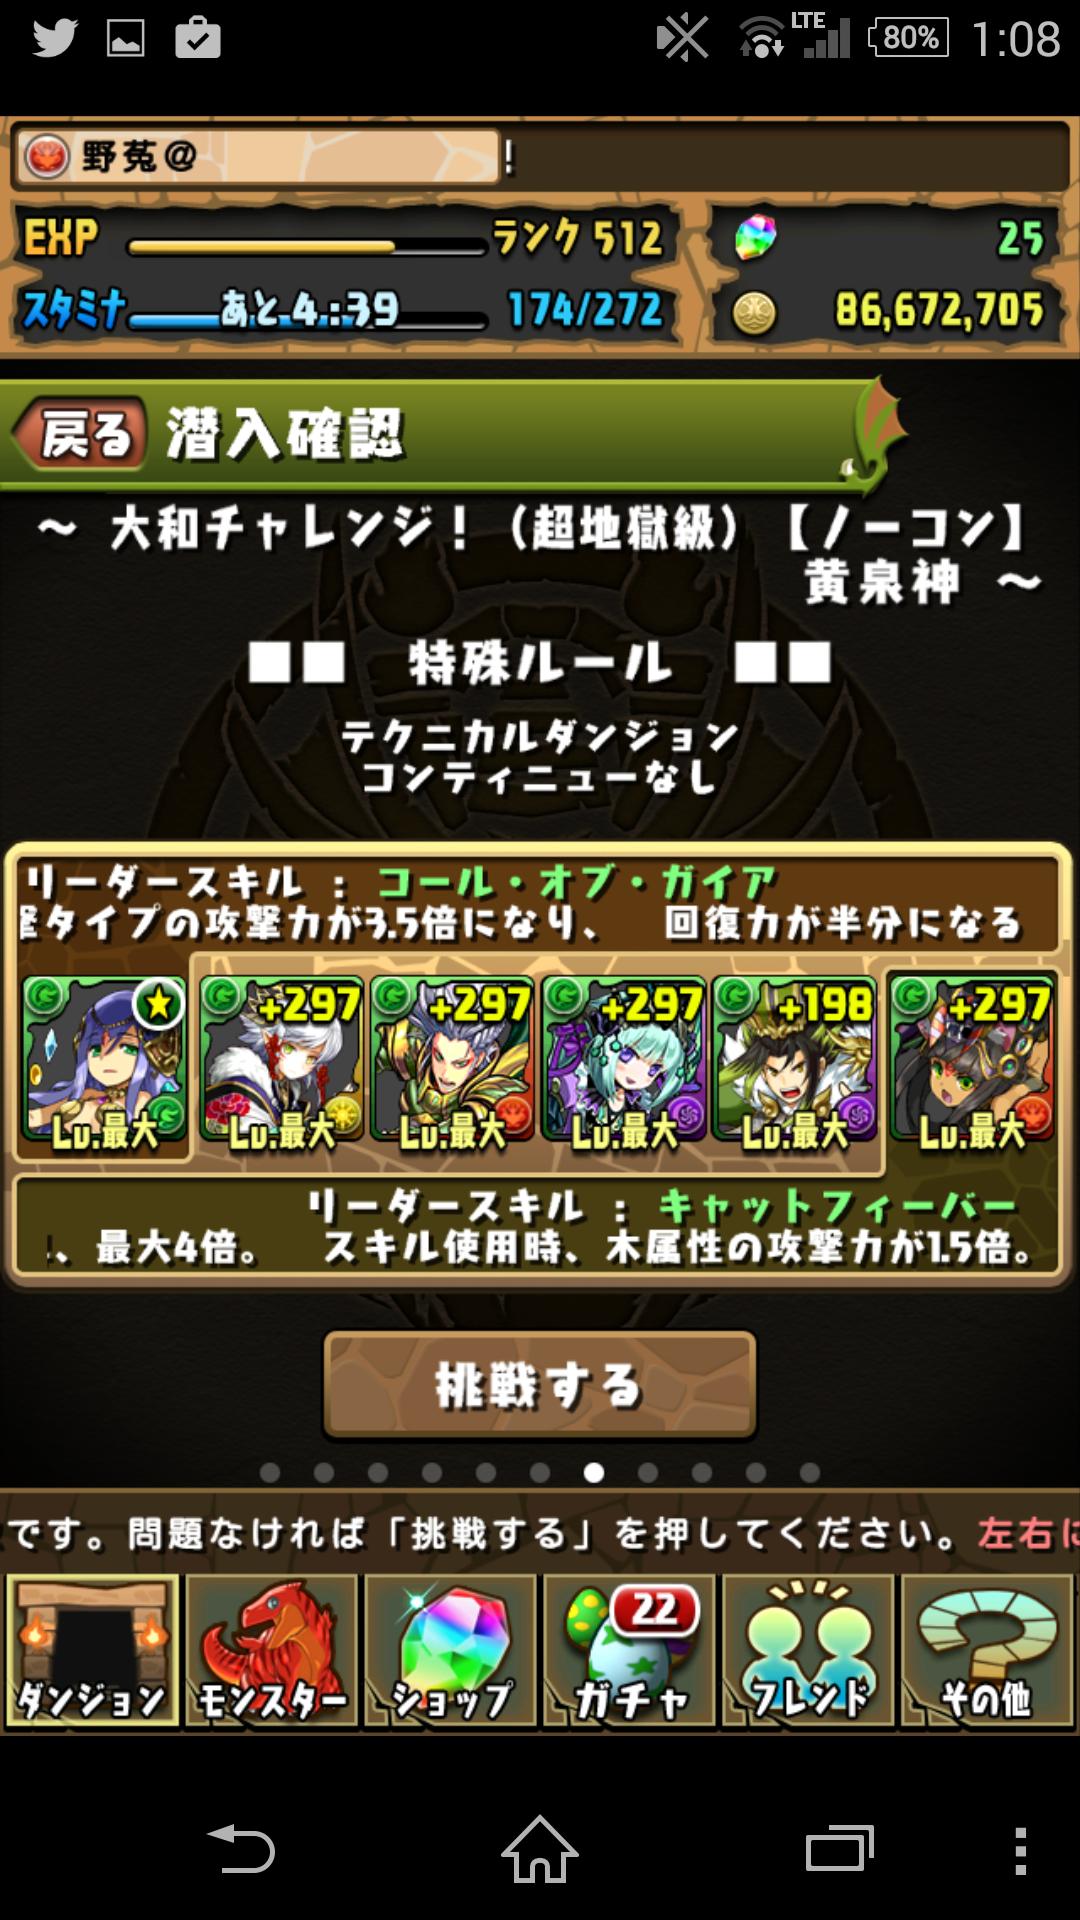 Screenshot_2015-07-10-01-08-47.png